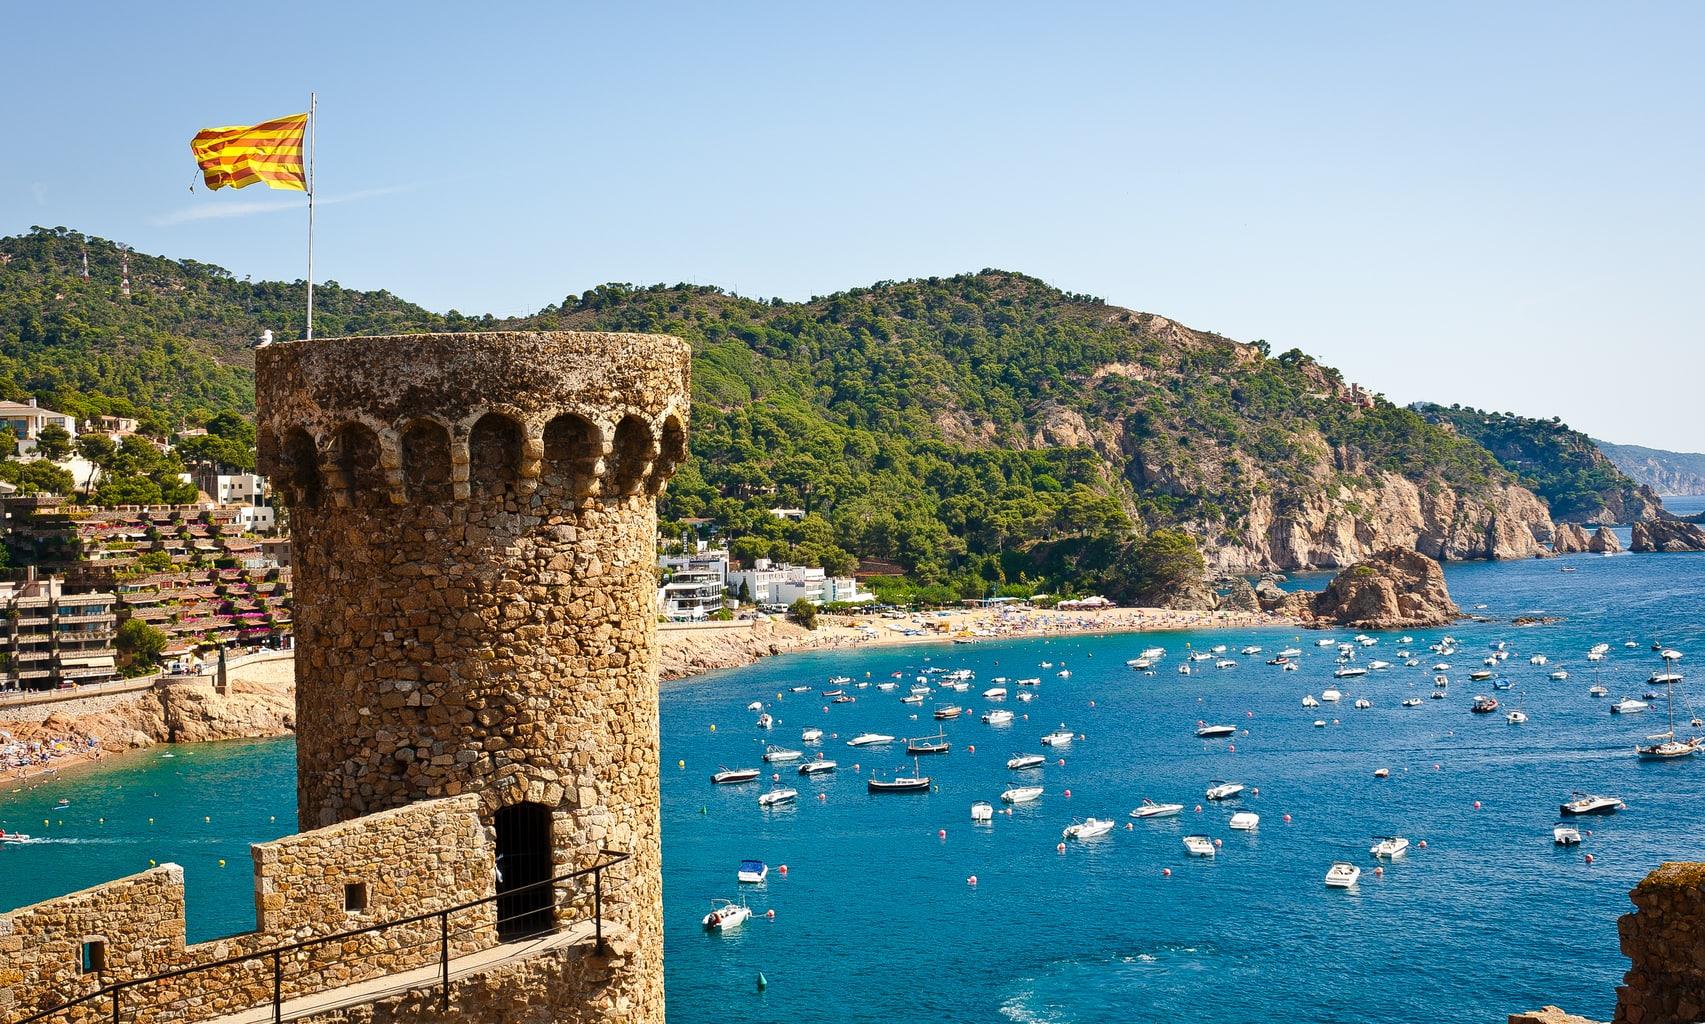 Spanish Castles Tossa de Mar